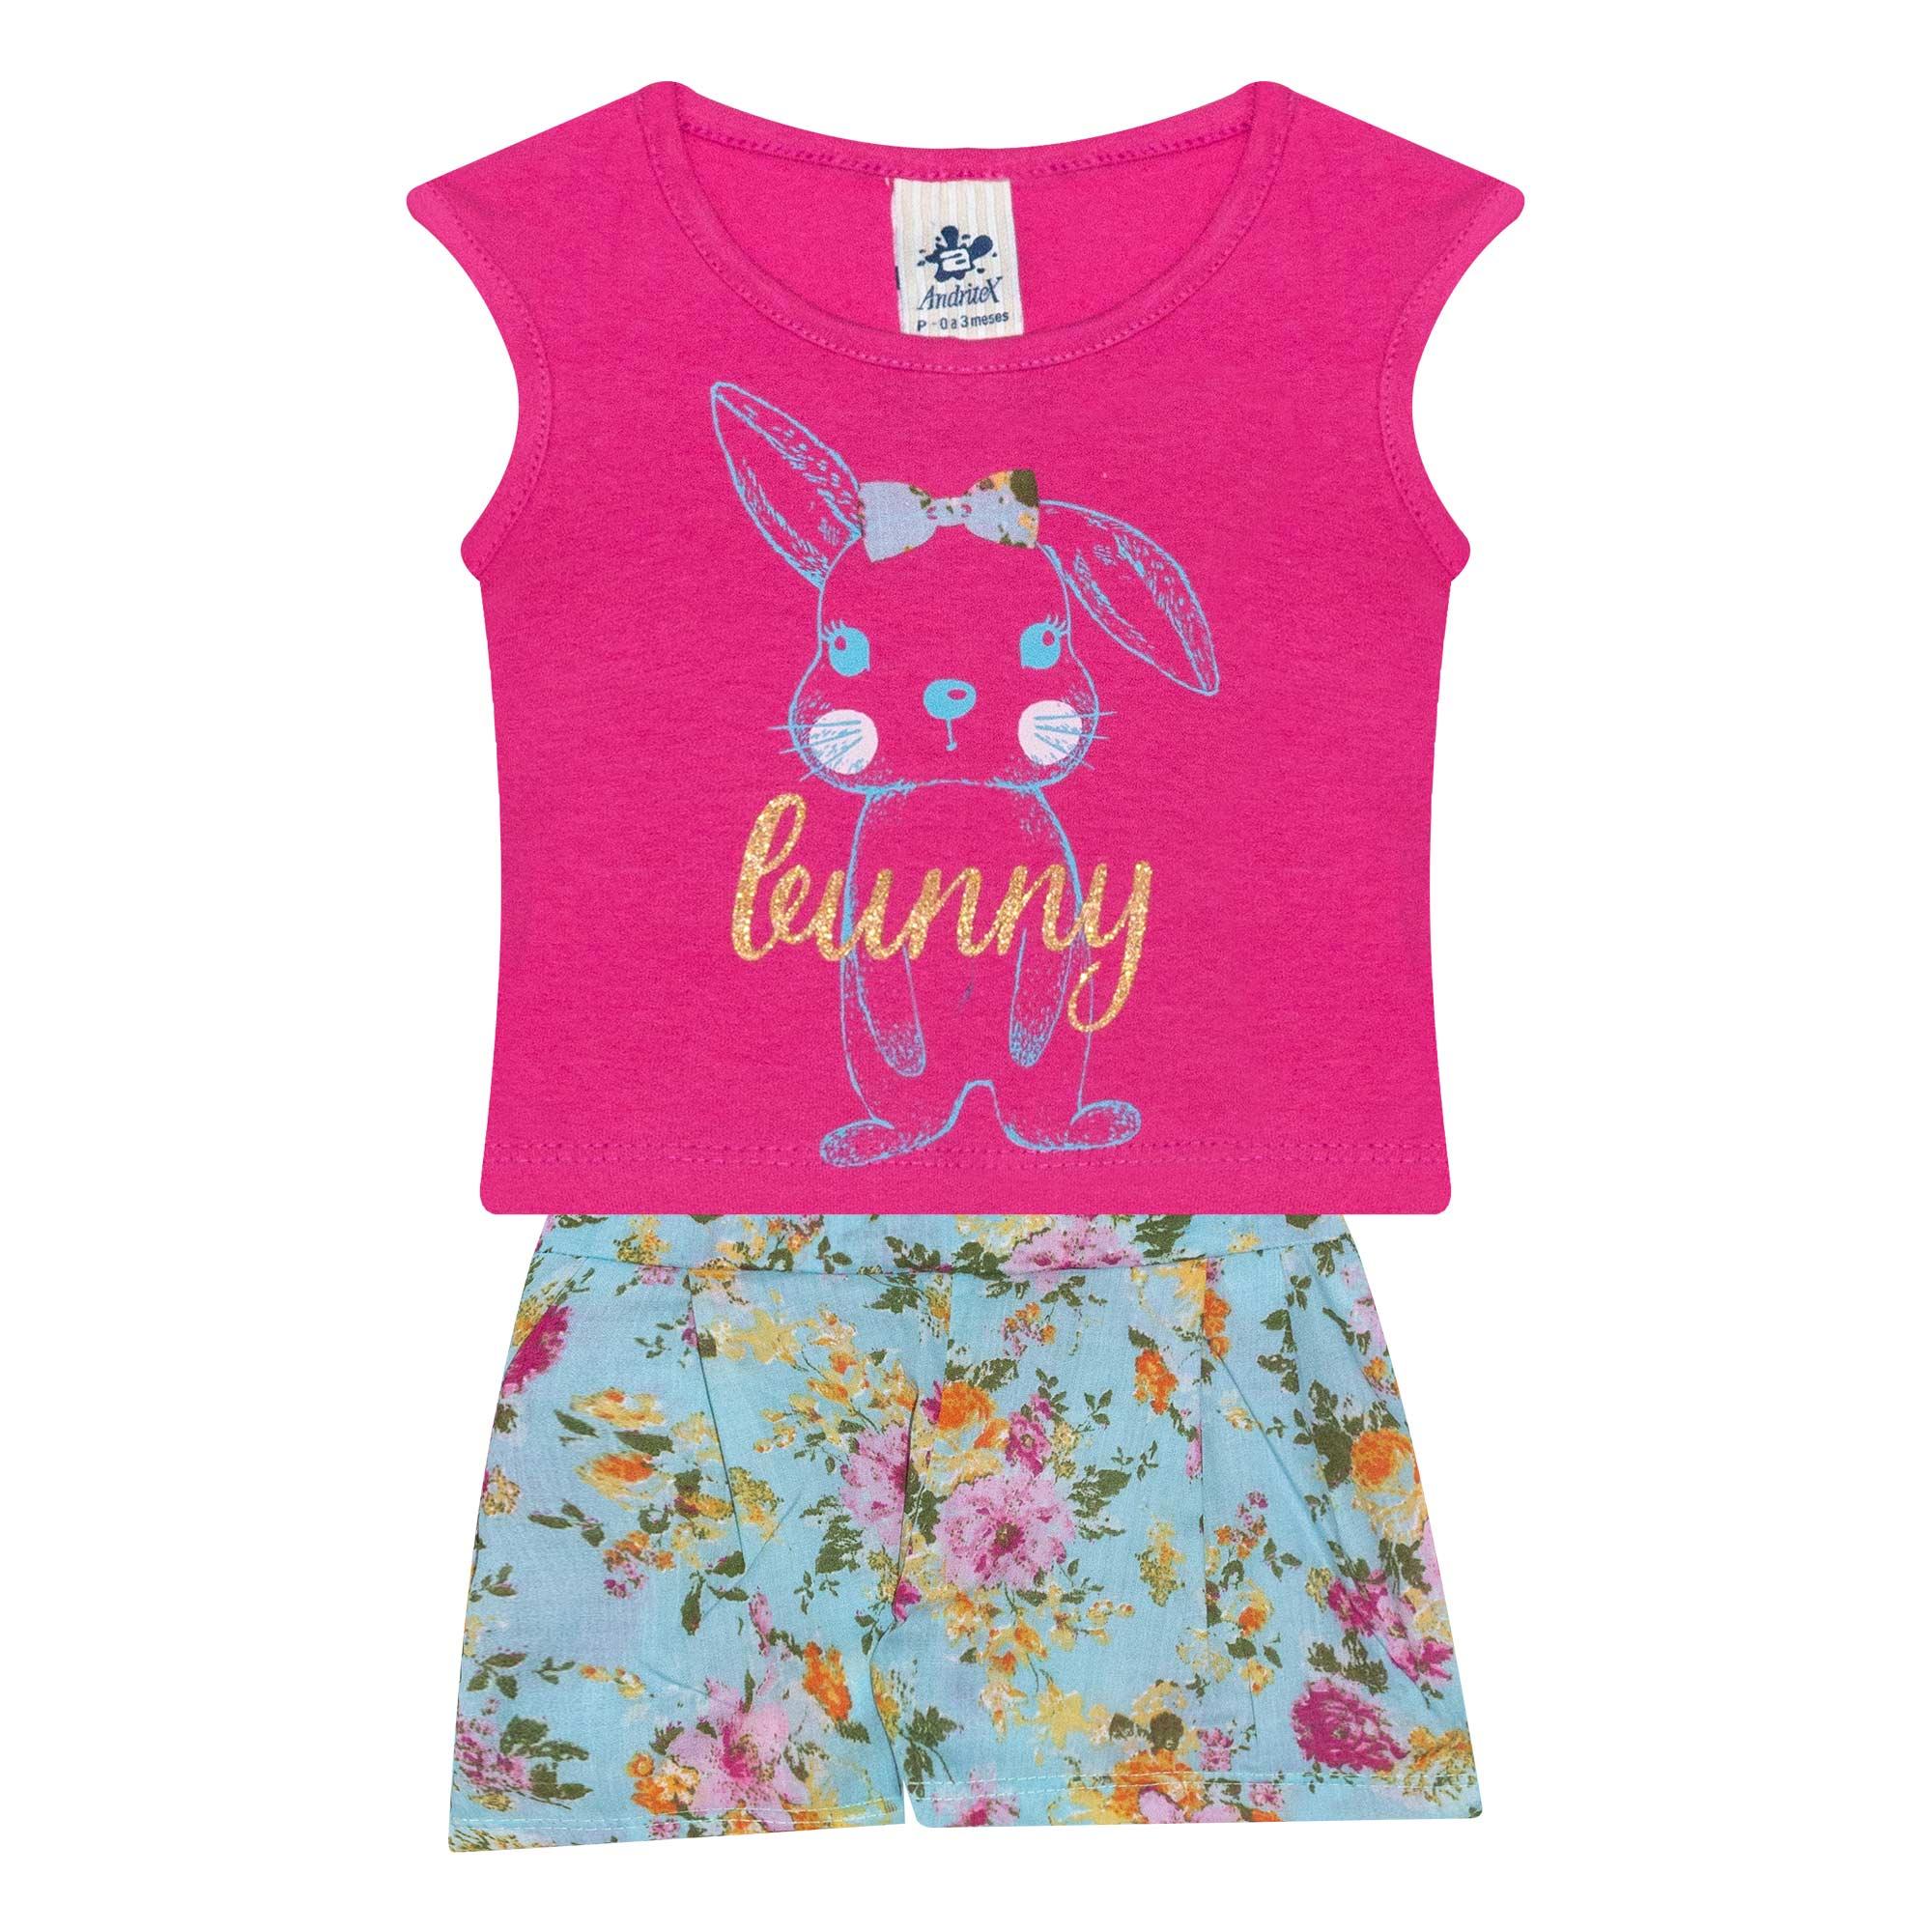 Conjunto Infantil Feminino Coelhinho - Ref 4683 - Rosa - Andritex